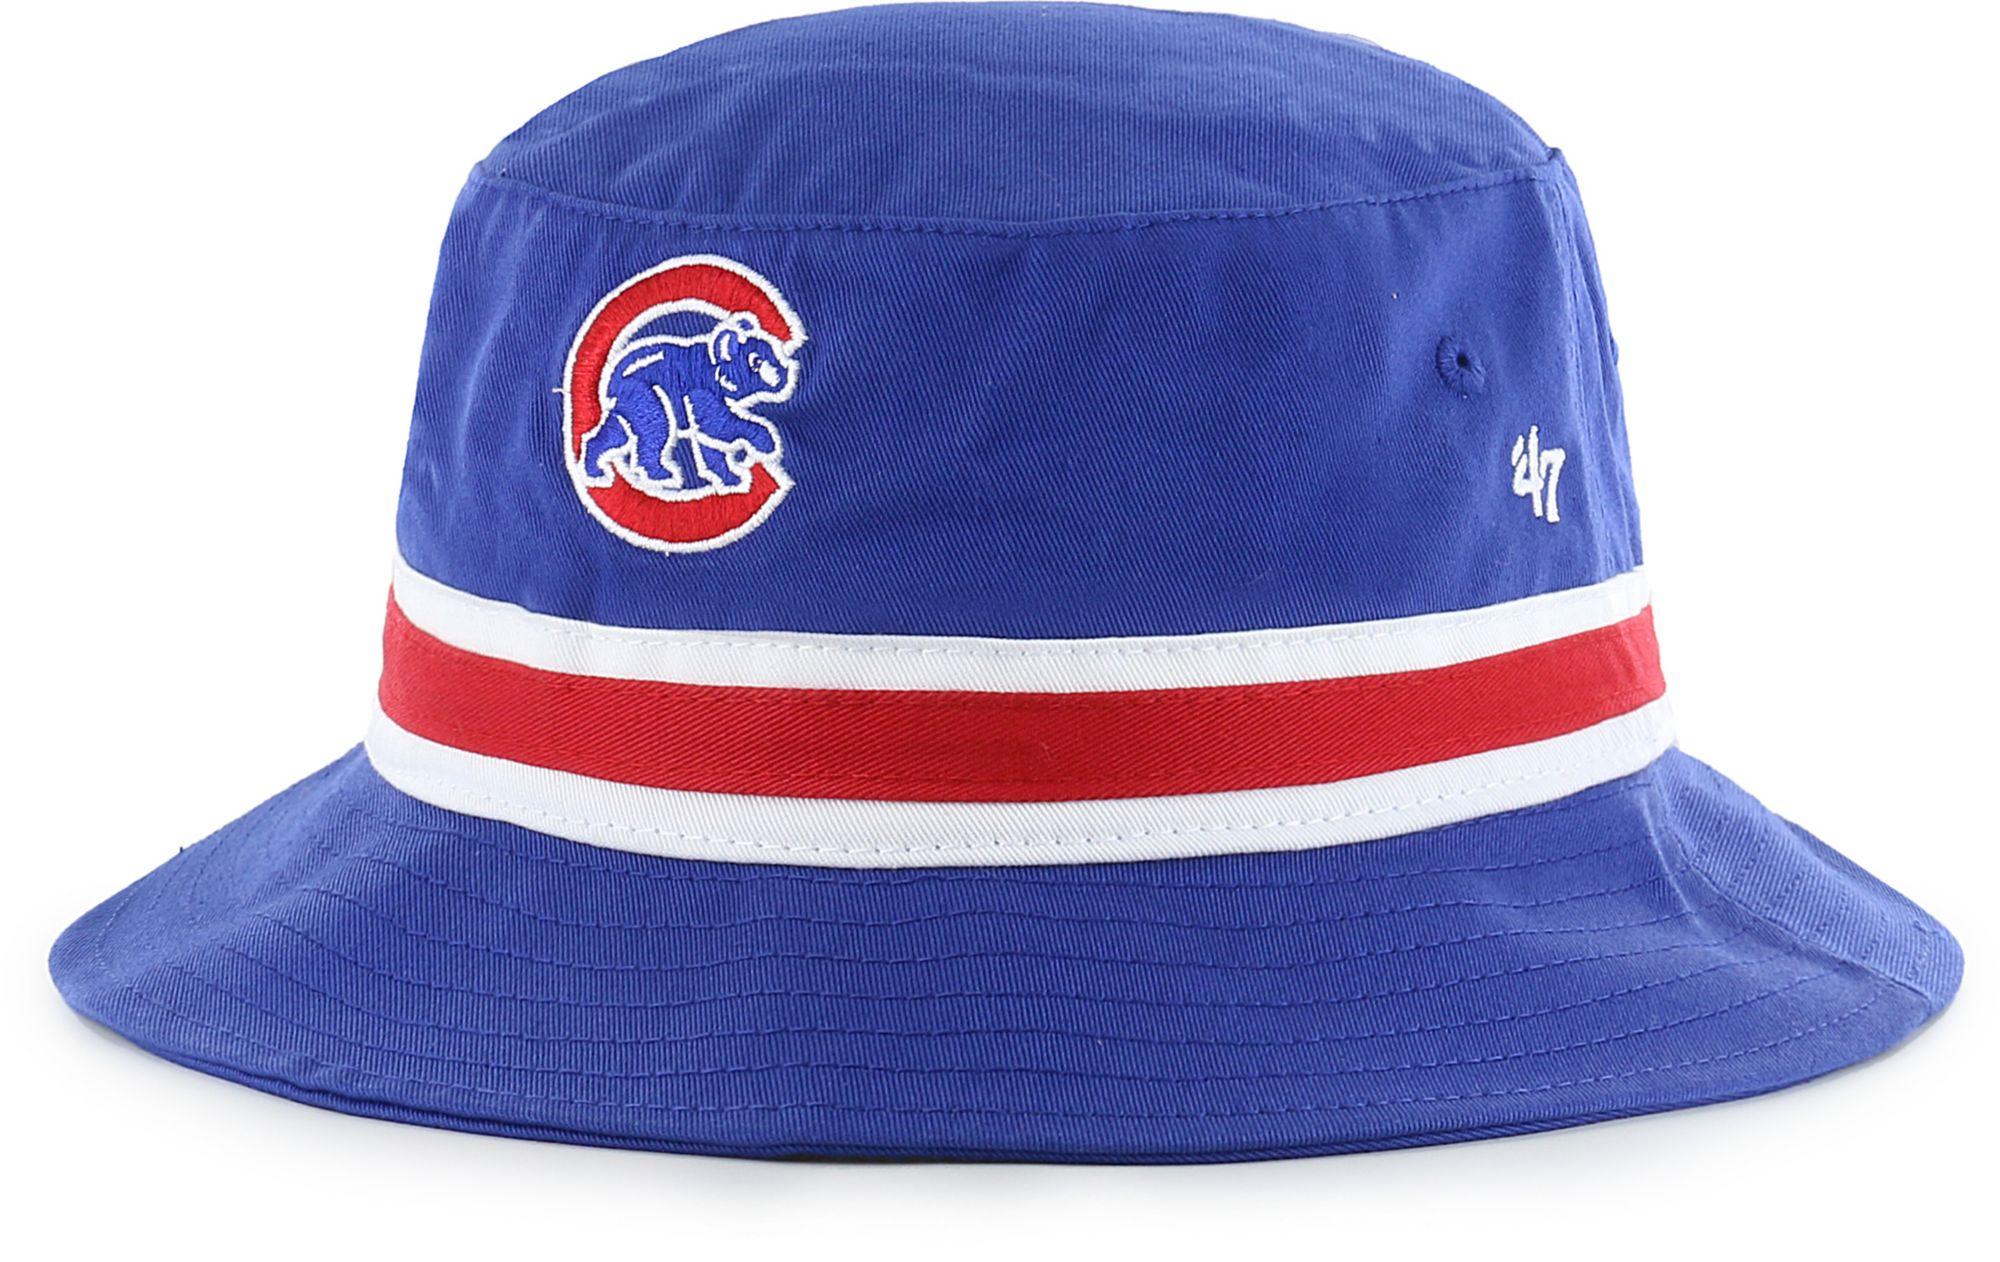 13a1f0b207b ... inexpensive 47 mens chicago cubs striped bucket hat 1ac54 35b4e